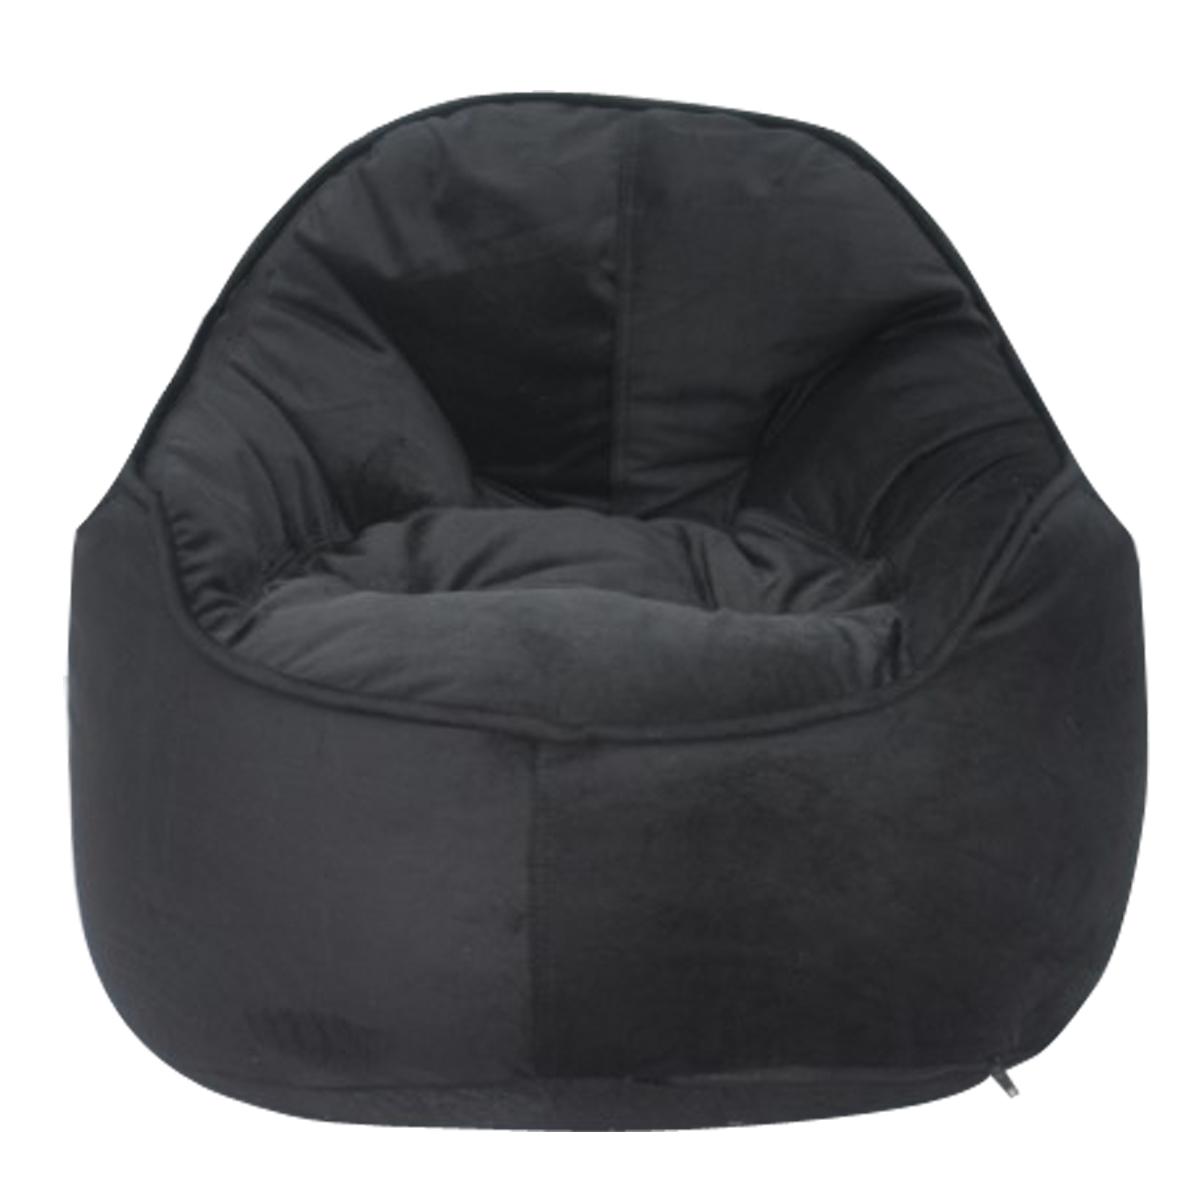 Astounding Mini Me Pod Bean Bag Chair Black Squirreltailoven Fun Painted Chair Ideas Images Squirreltailovenorg